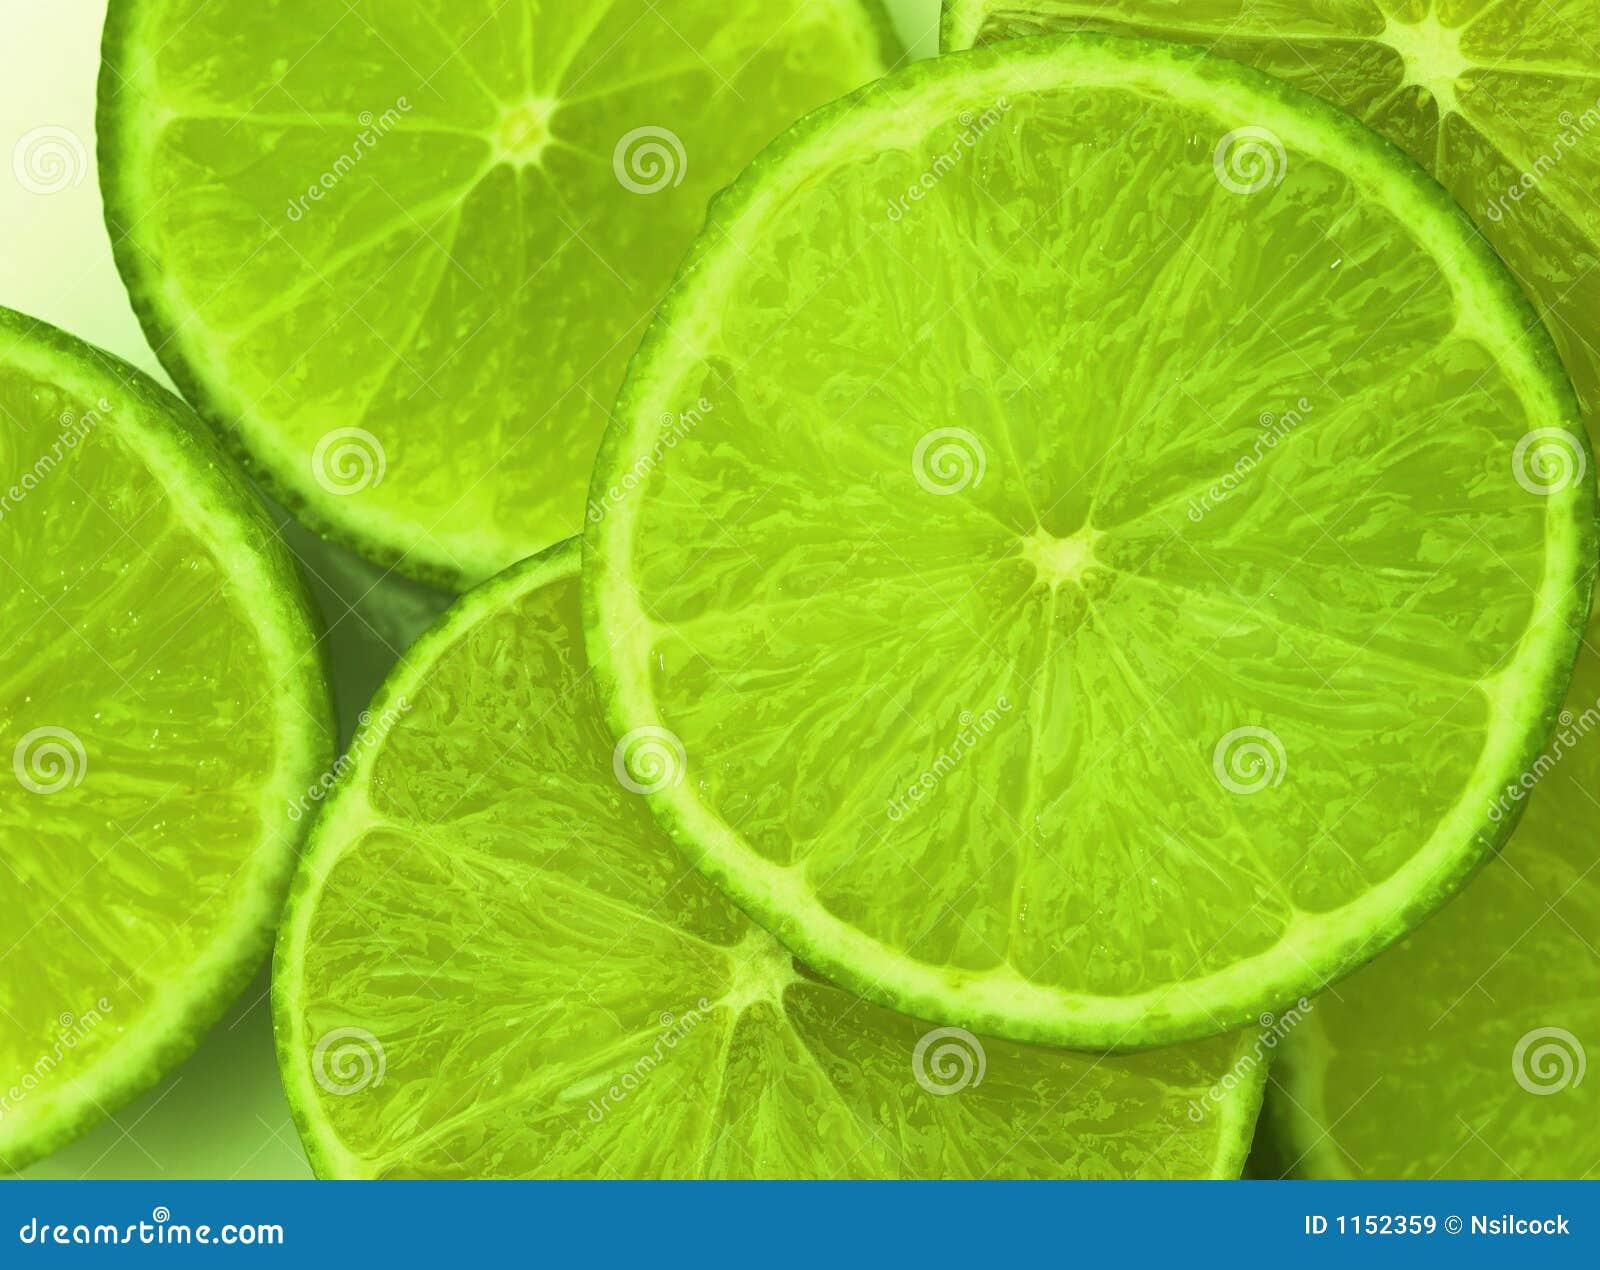 green lemons royalty free stock images image 1152359